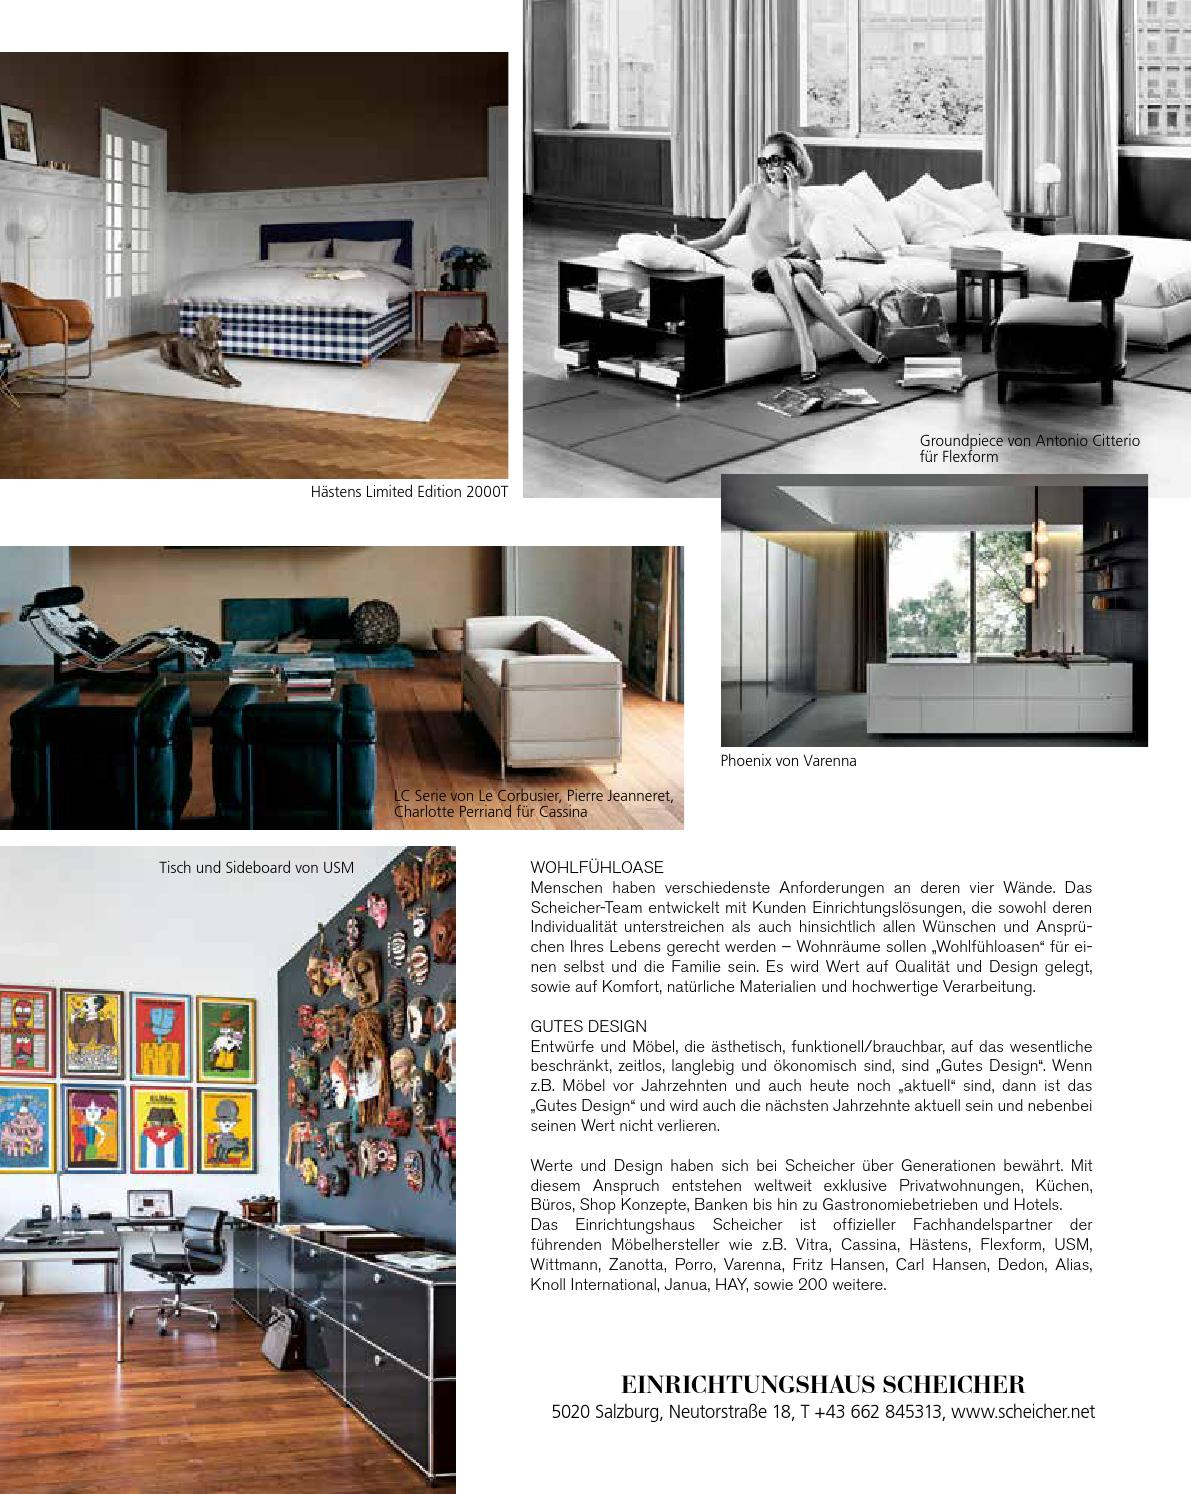 Circe Magazin Salzburg No.6 HW 2015 by Jacqueline Jurek - issuu